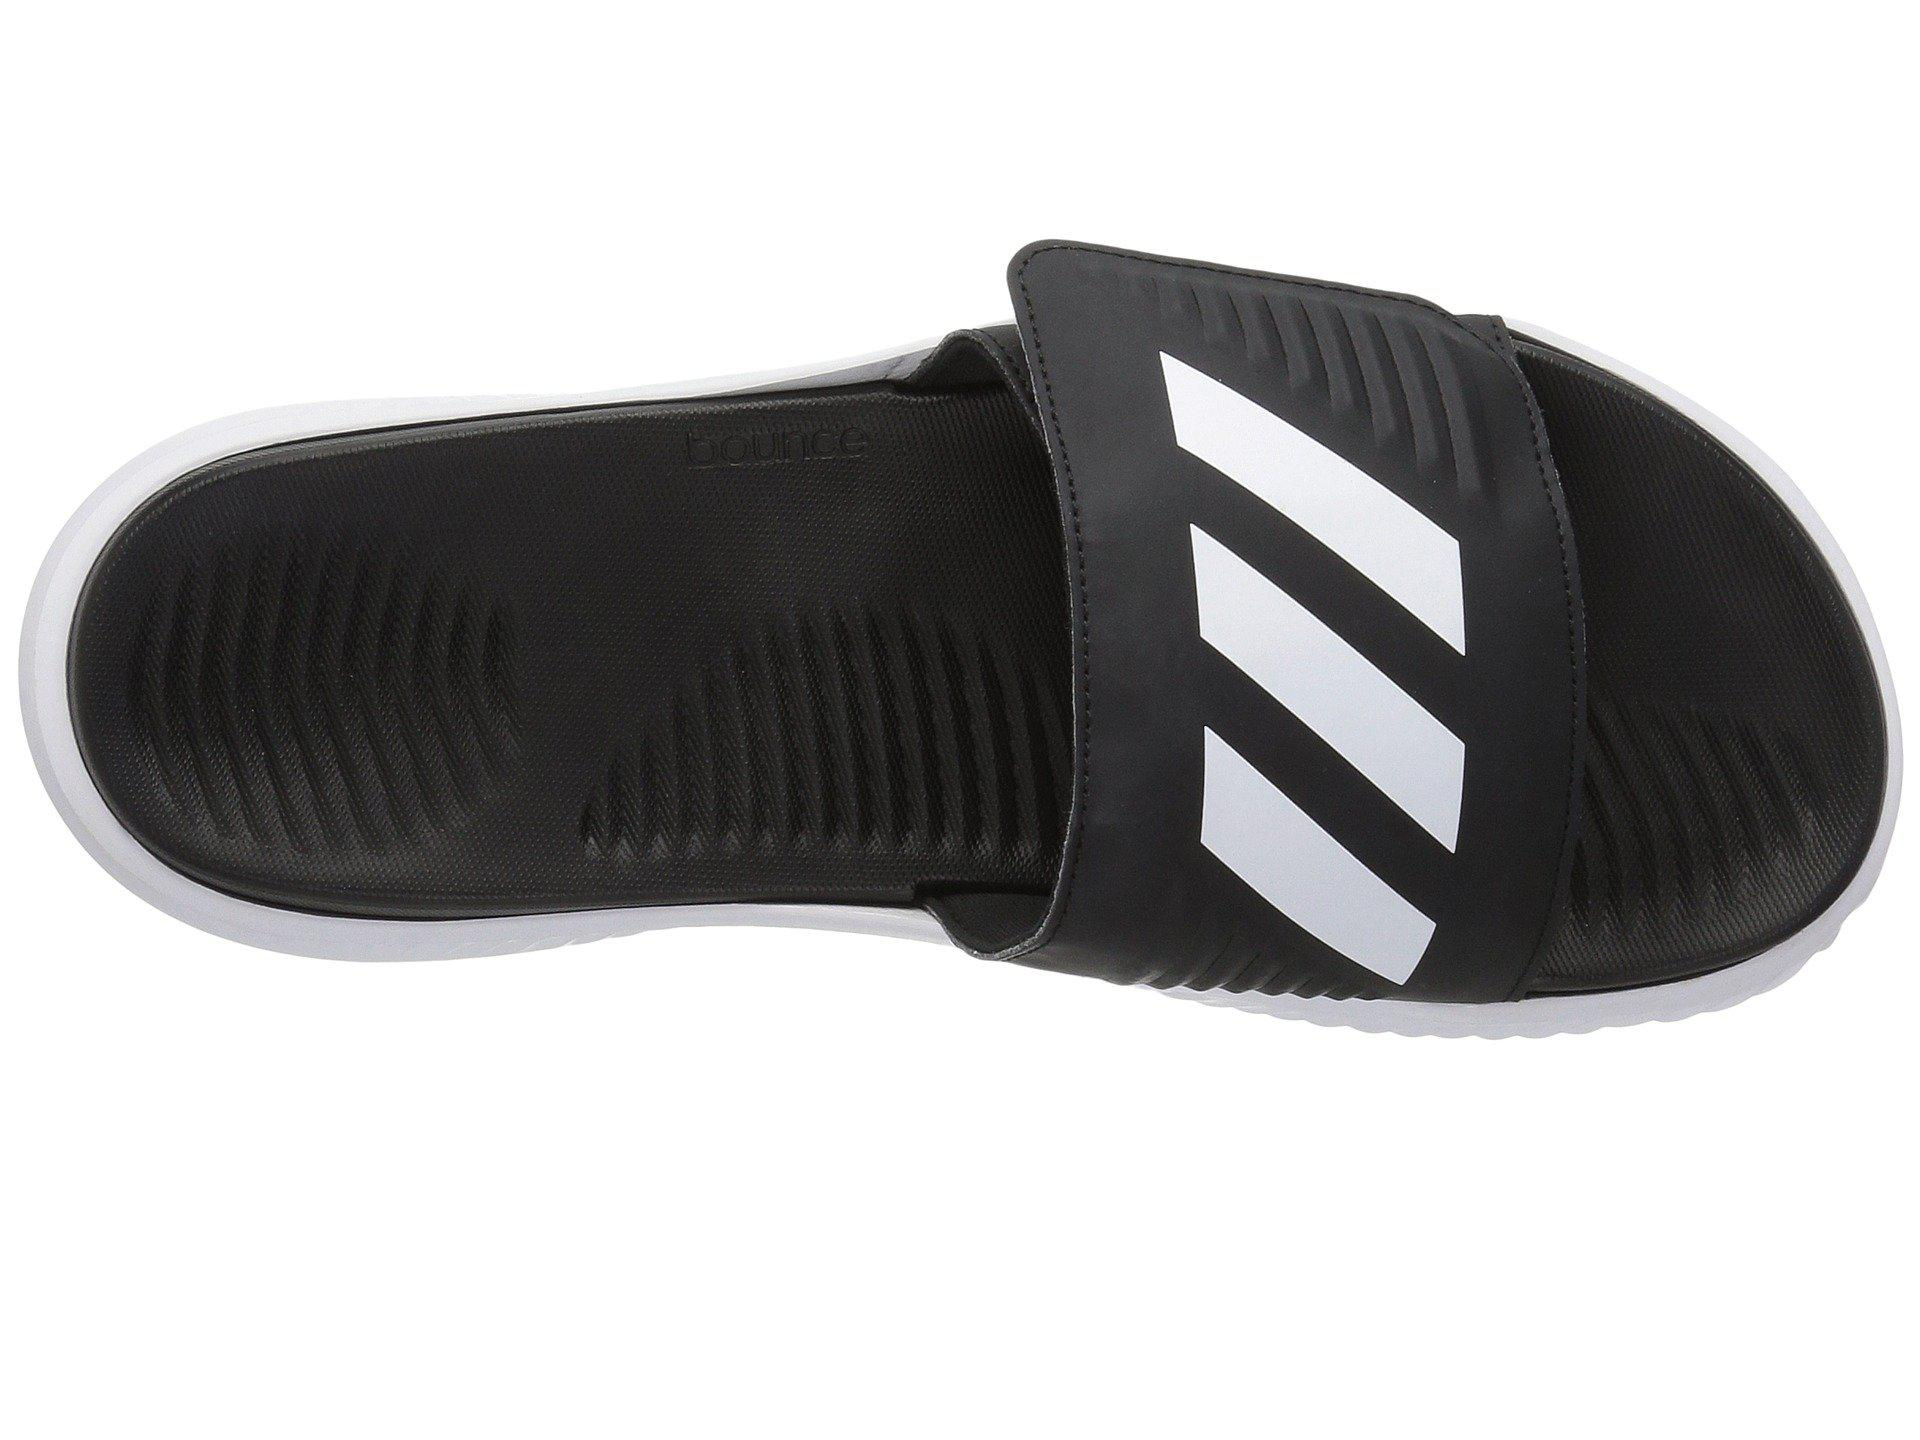 03e98f2b78ff Adidas - Alphabounce Slide (footwear White core Black) Men s Slide Shoes  for Men. View fullscreen